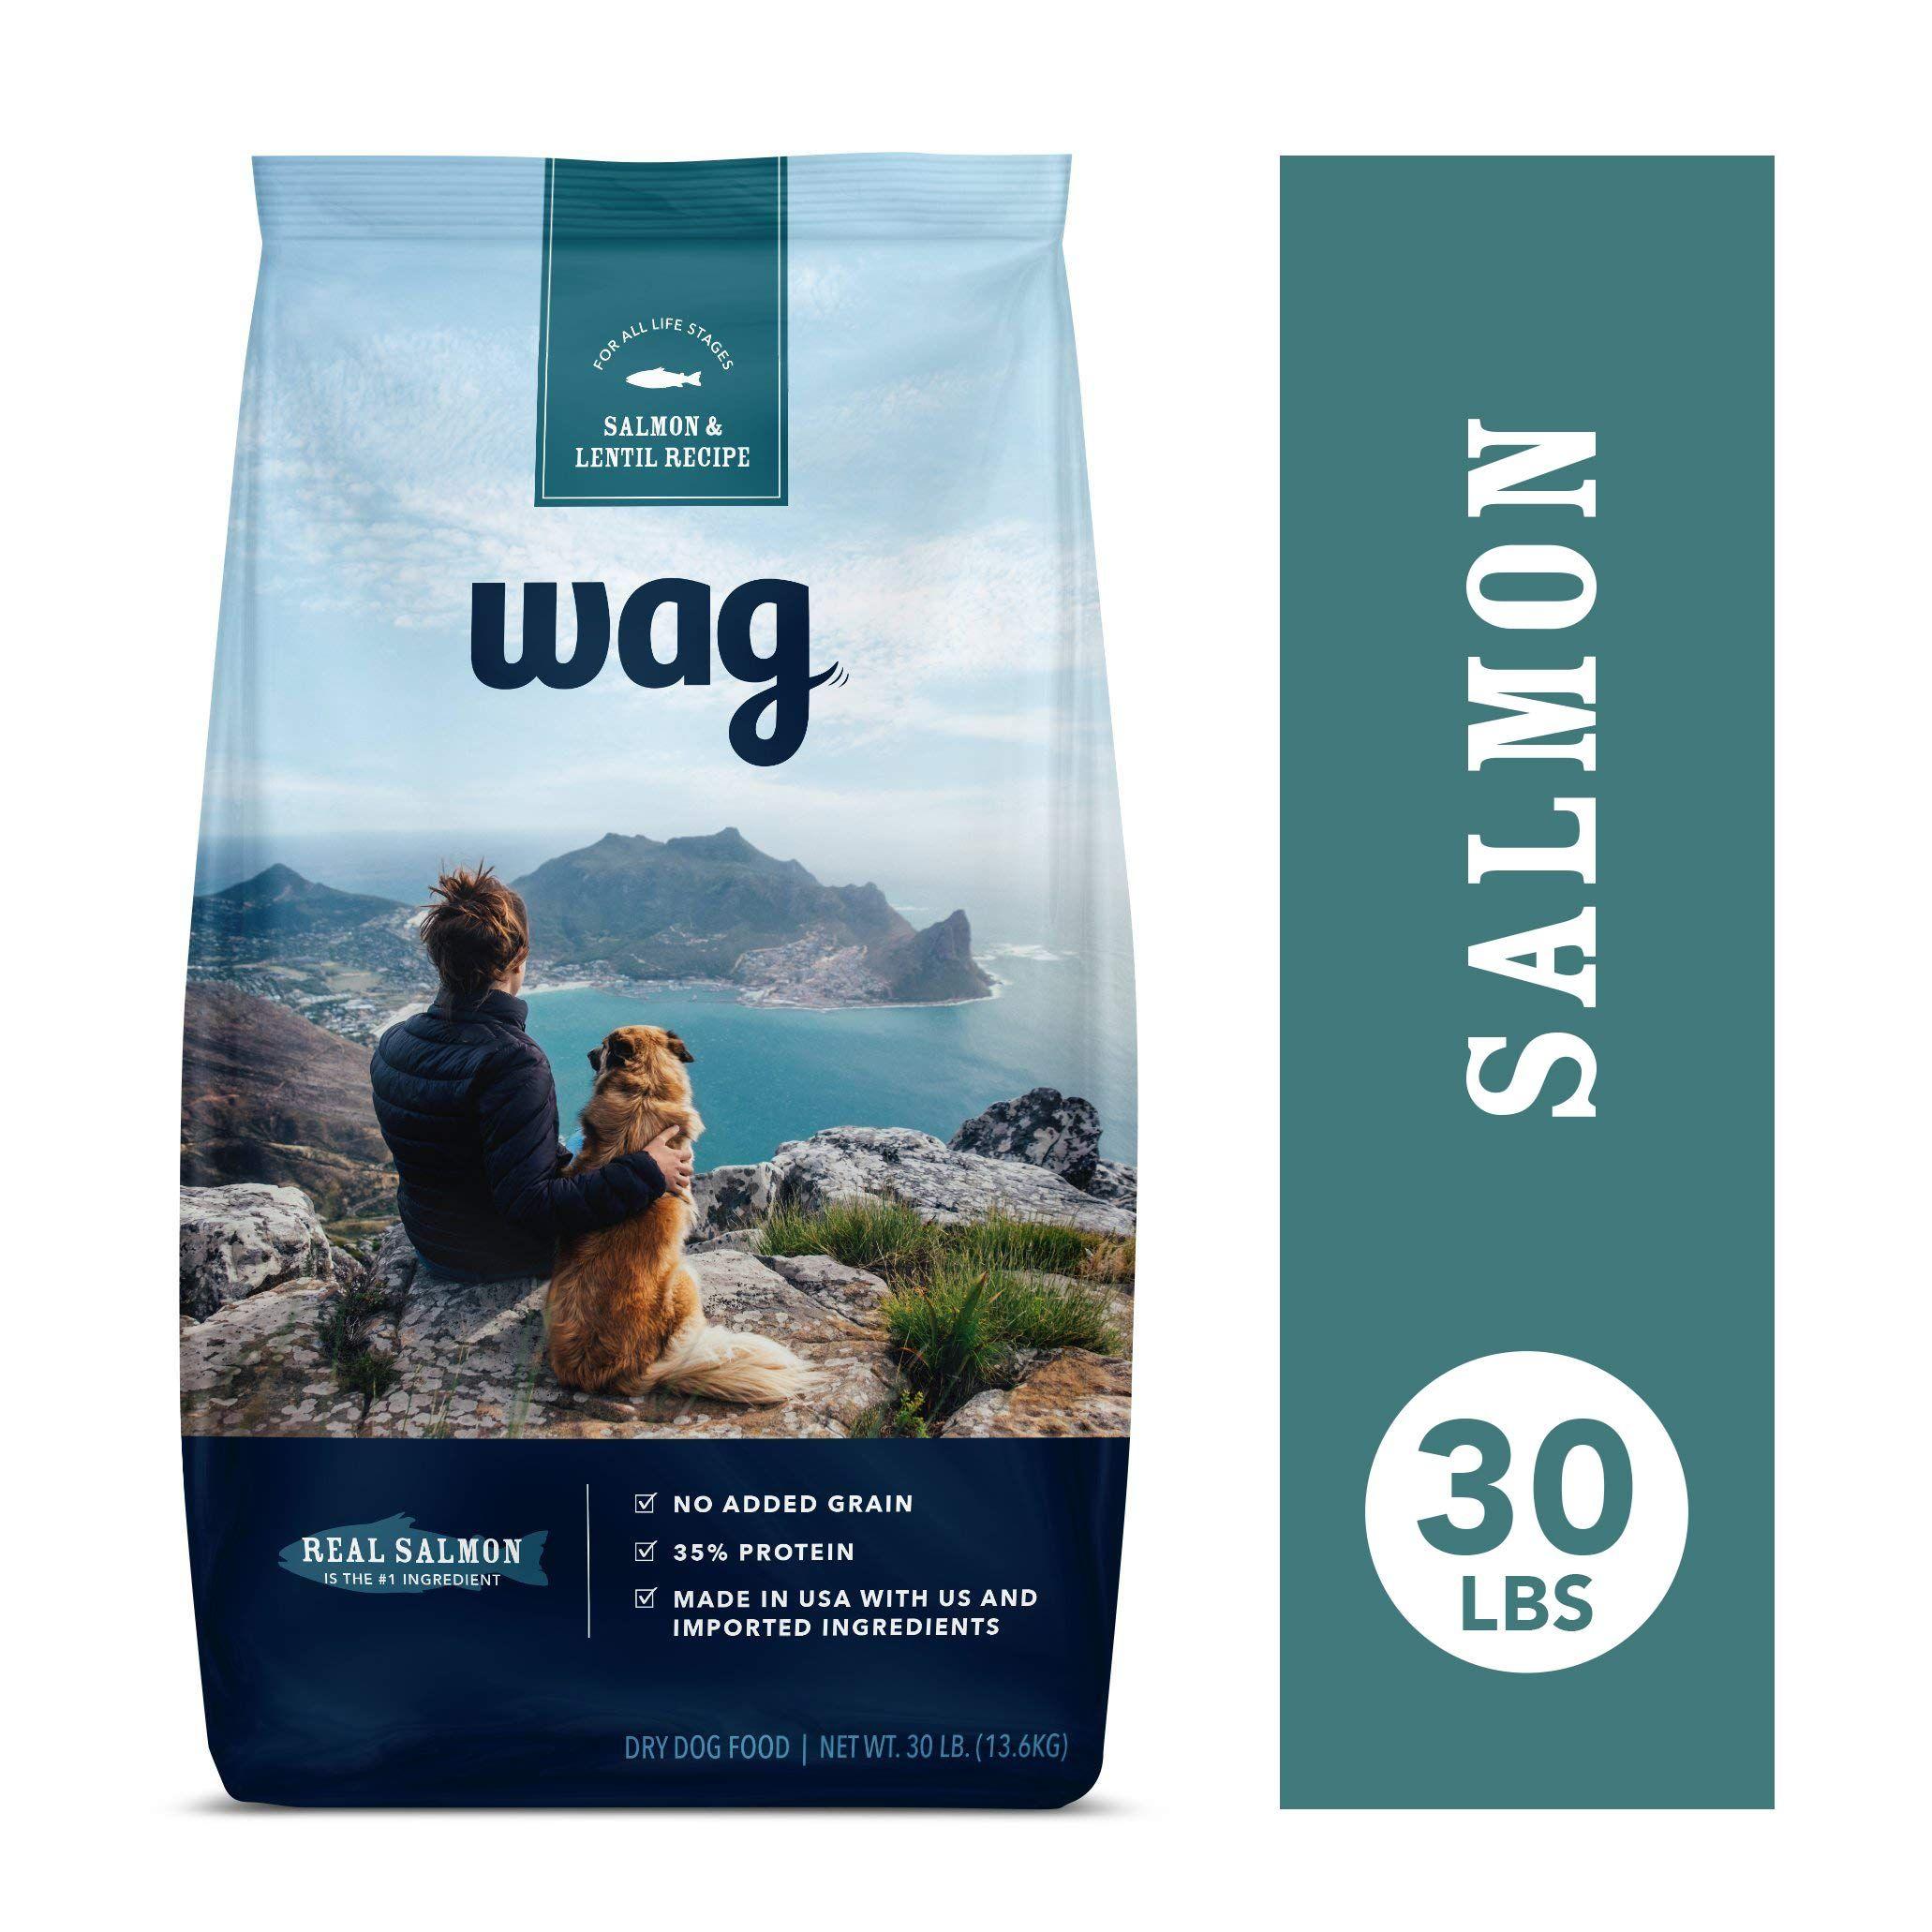 Wag Amazon Brand Dry Dog Food Dry Dog Food Best Dog Food Dog